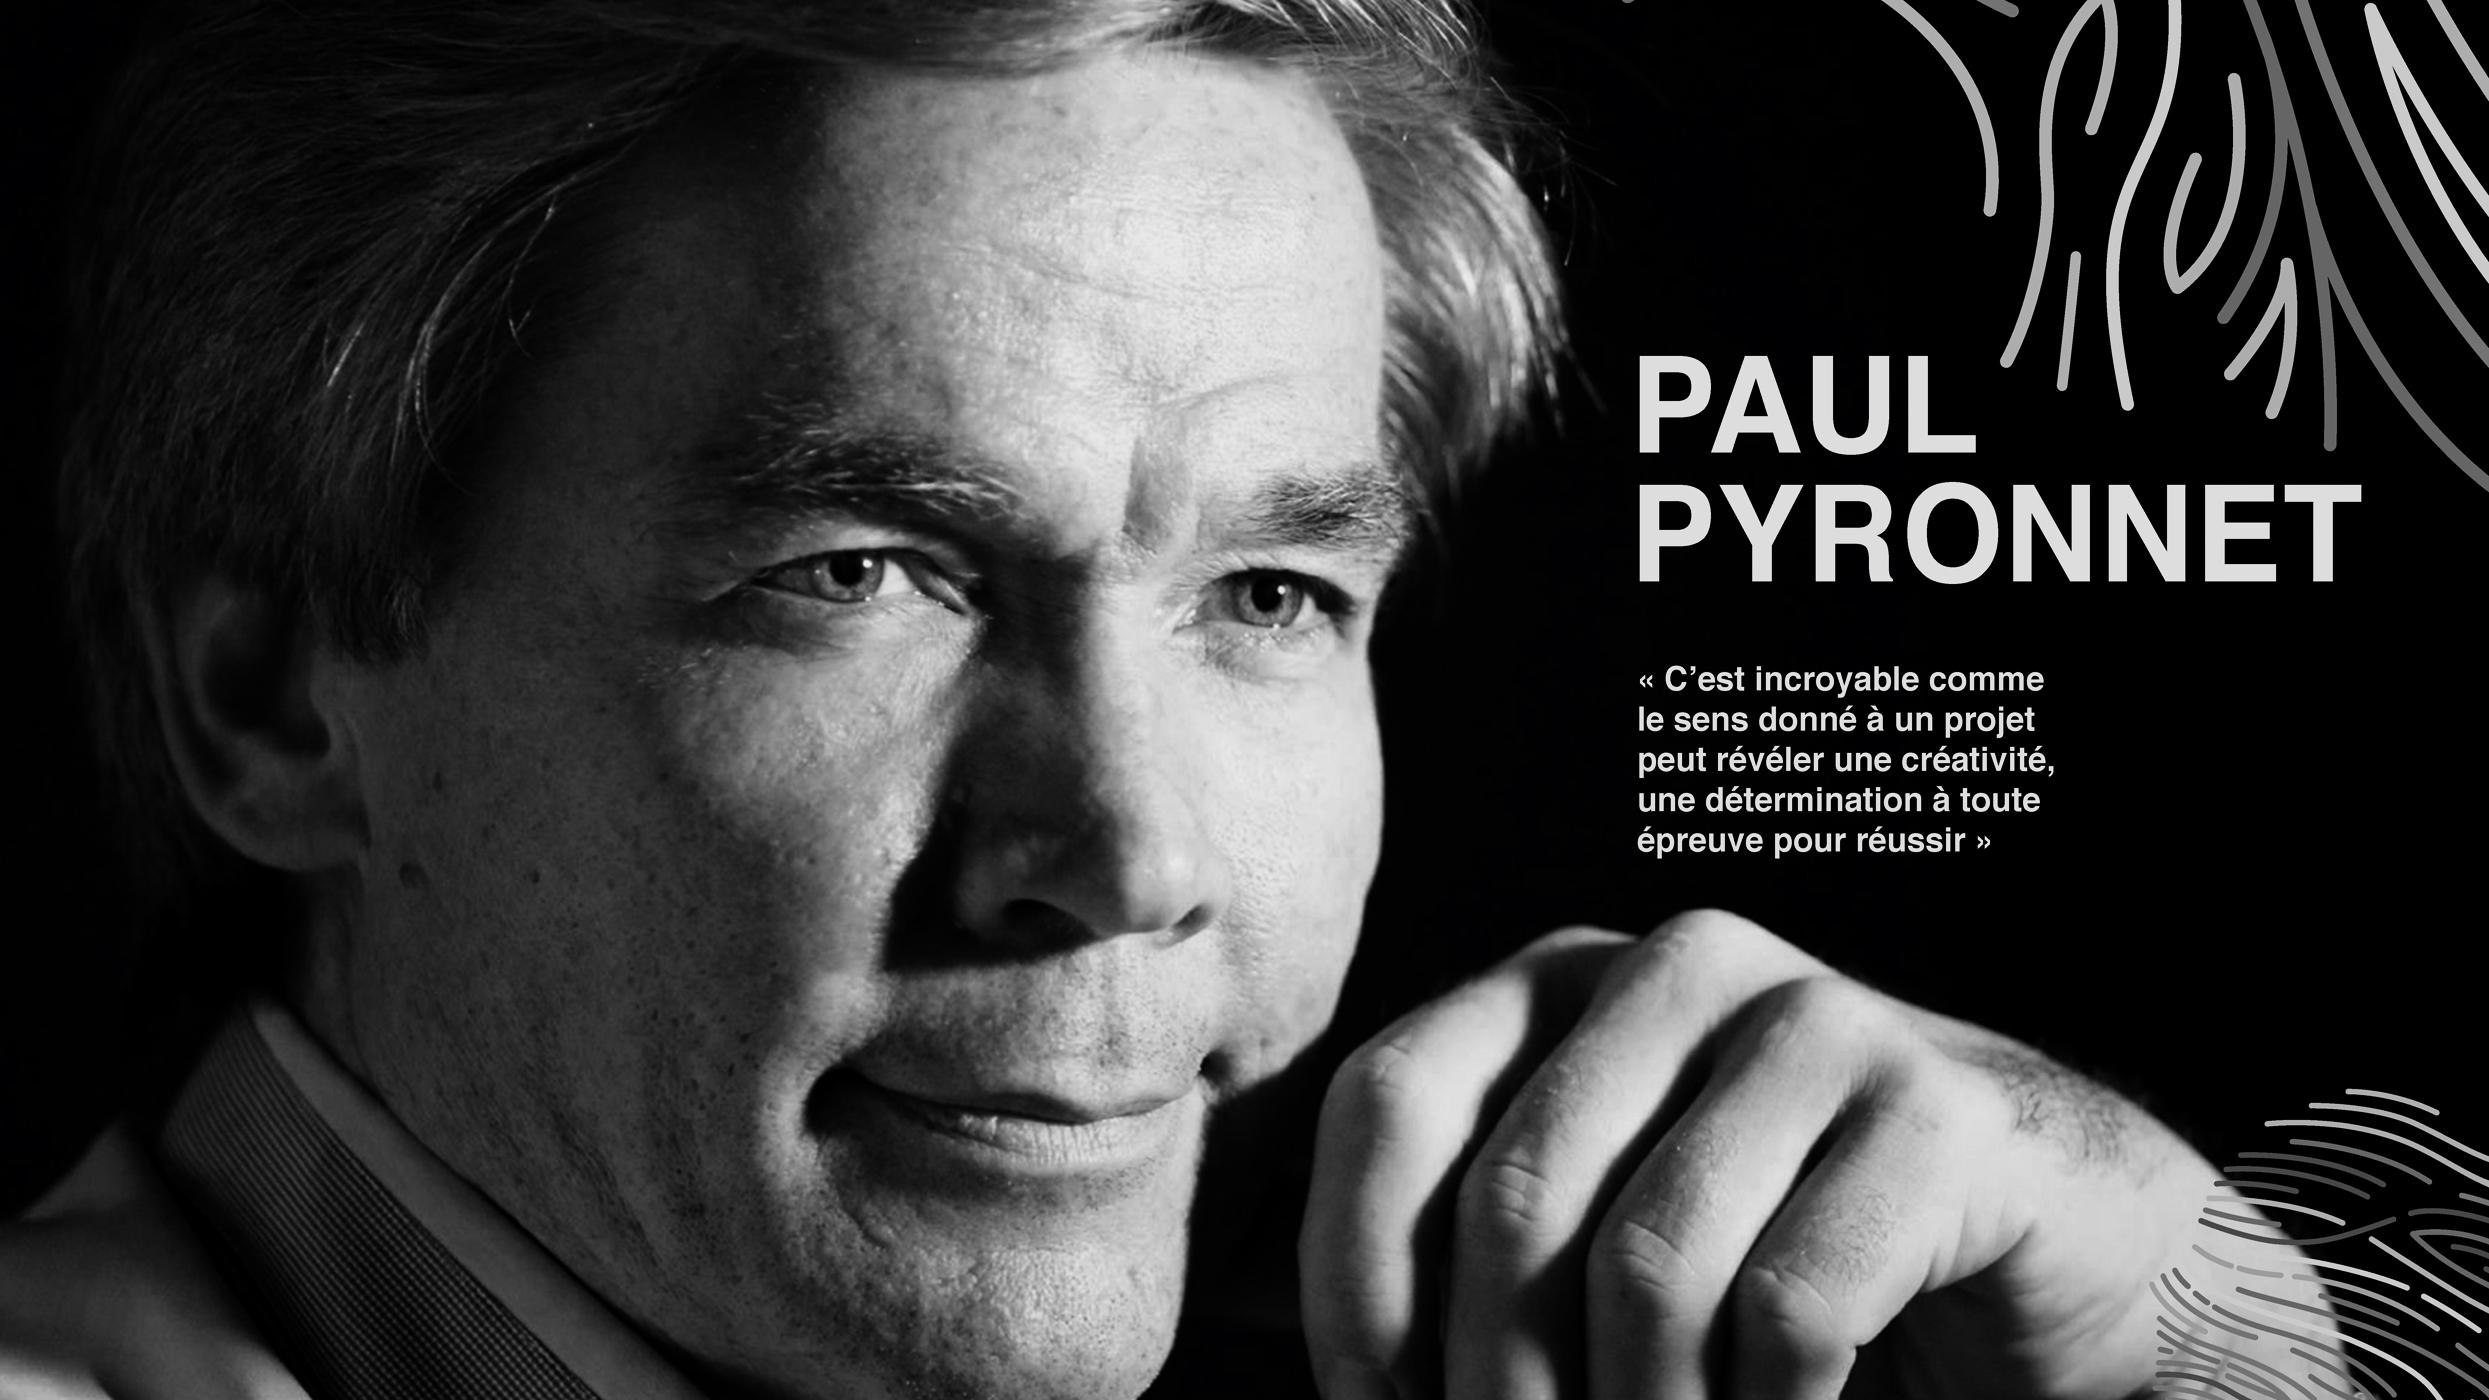 PAUL PYRONNET 11H30